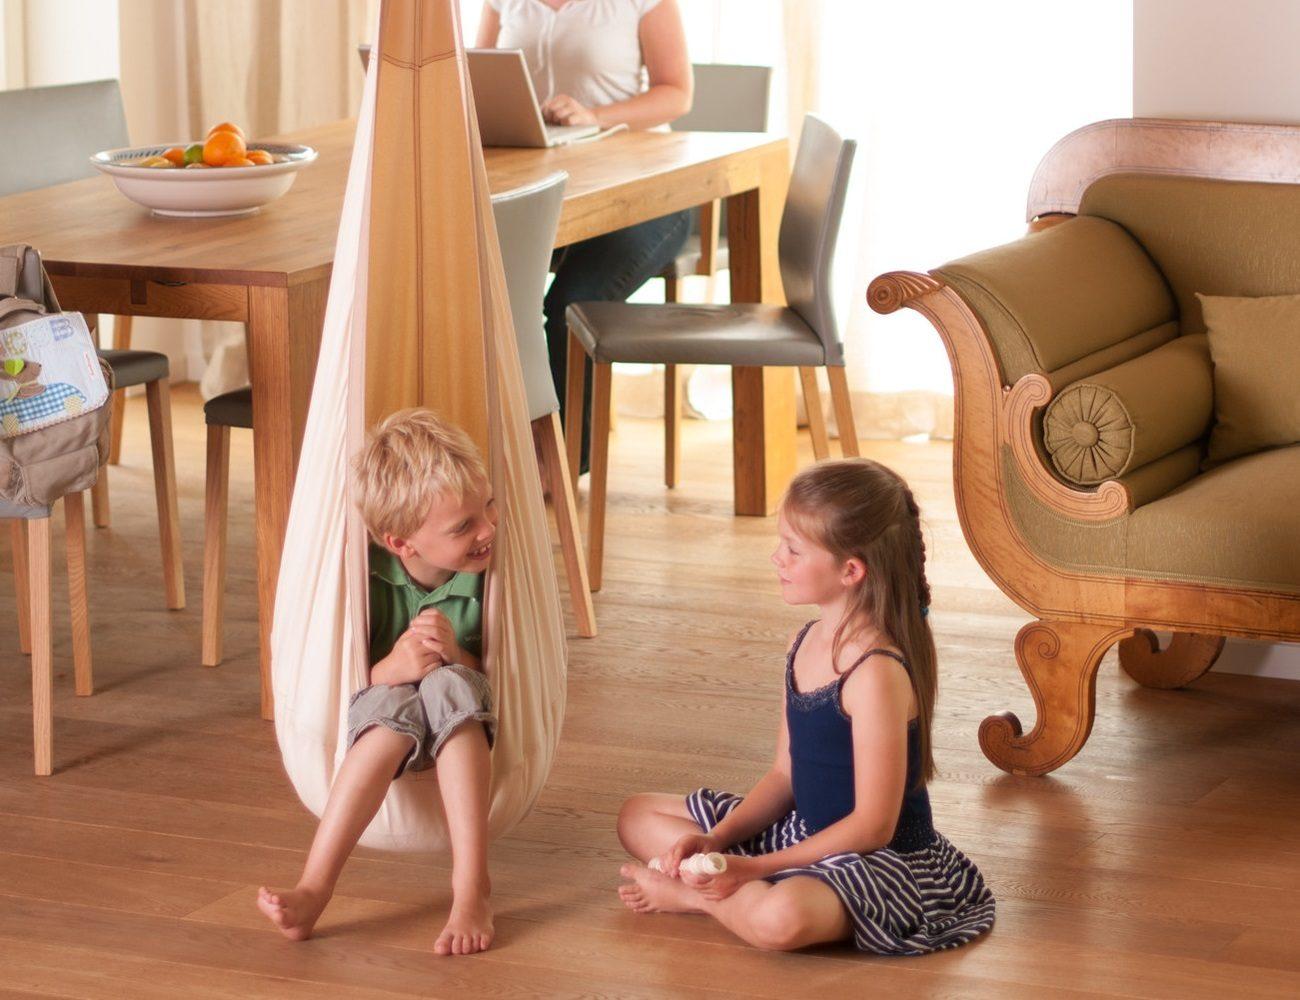 LA SIESTA Child Posture Friendly Hanging Crow's Nest Seat and Pod Hammock